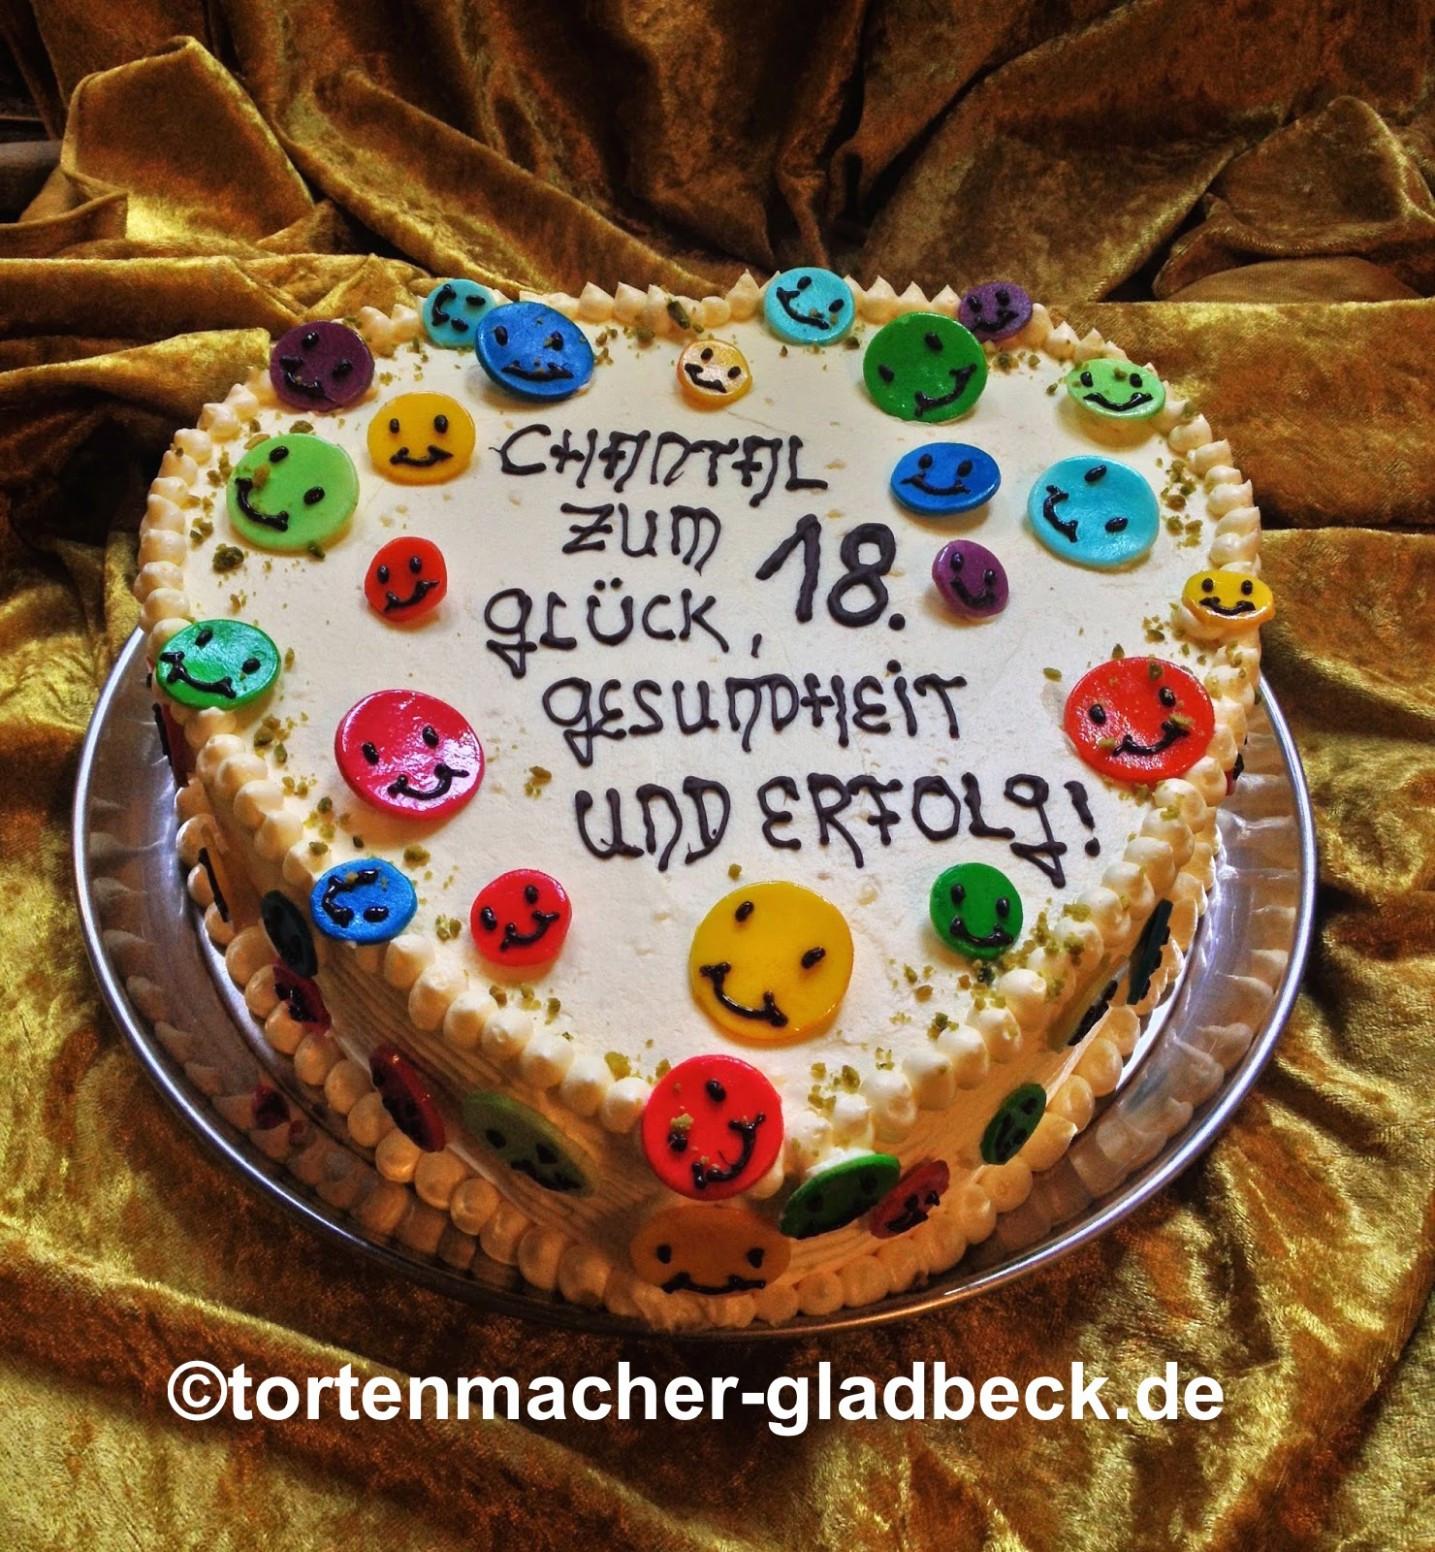 Geburtstagskuchen 18  geburtstagskuchen 18 – Geburtstagskuchenine